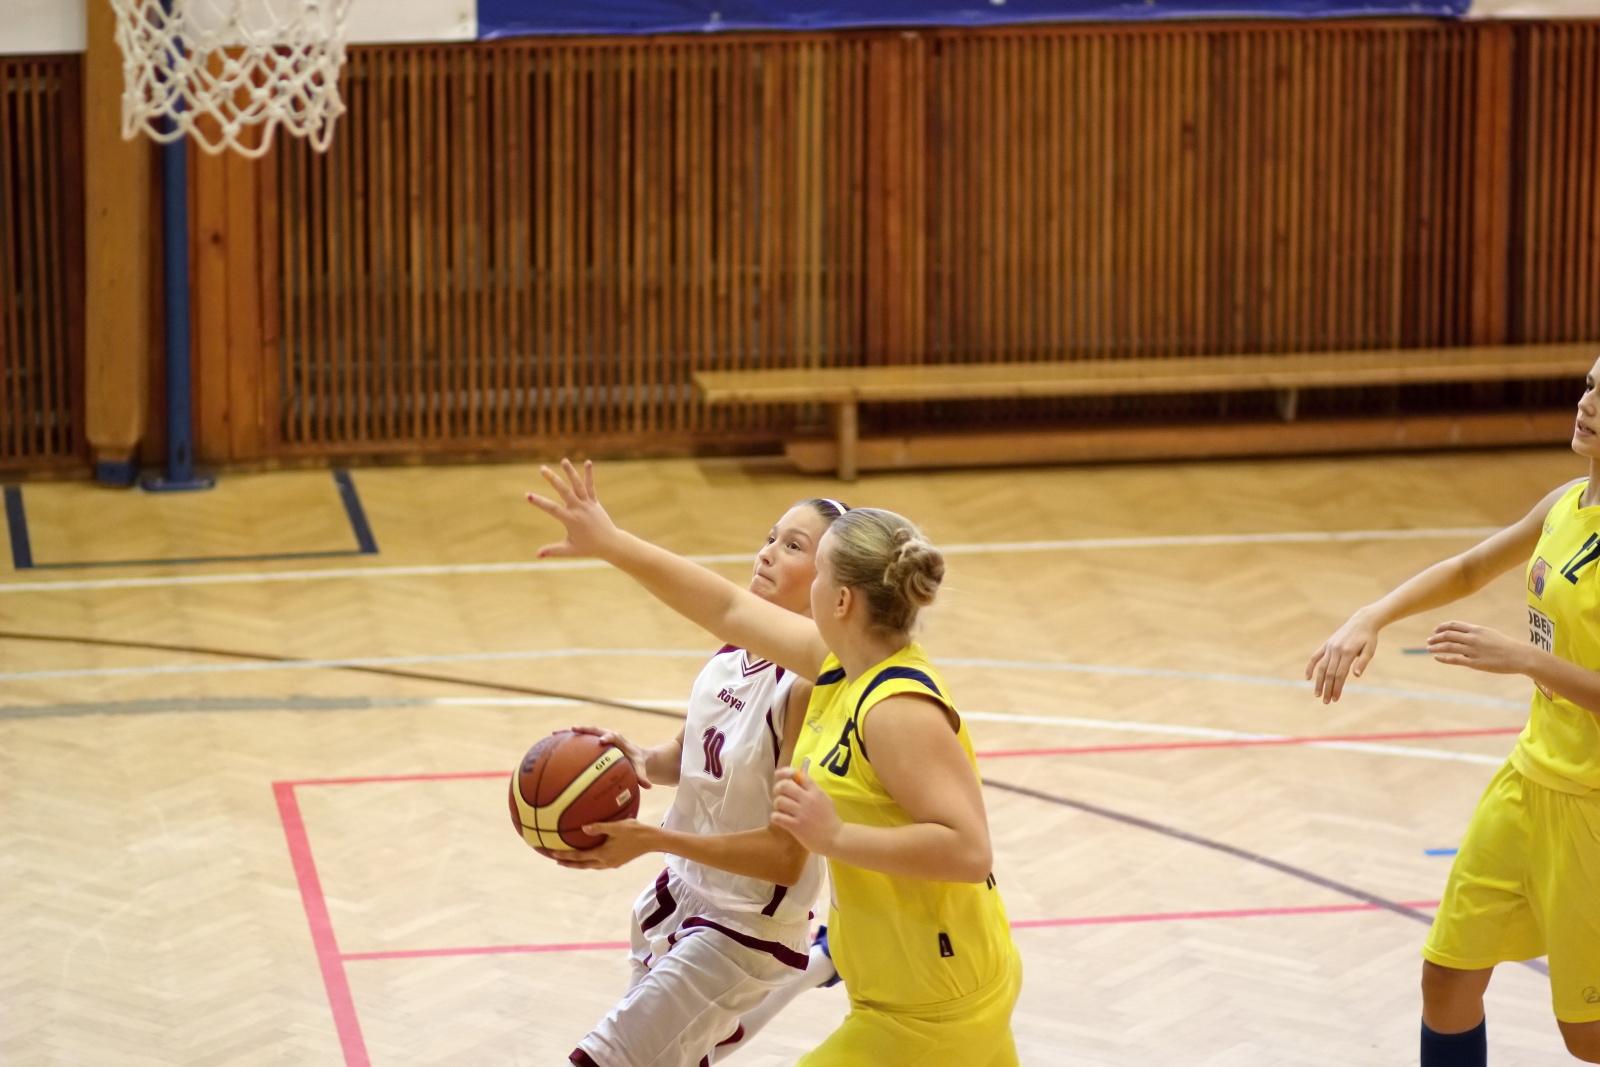 bk-zvolen-tydam-kosice-ziacky-basketbal-2011-13